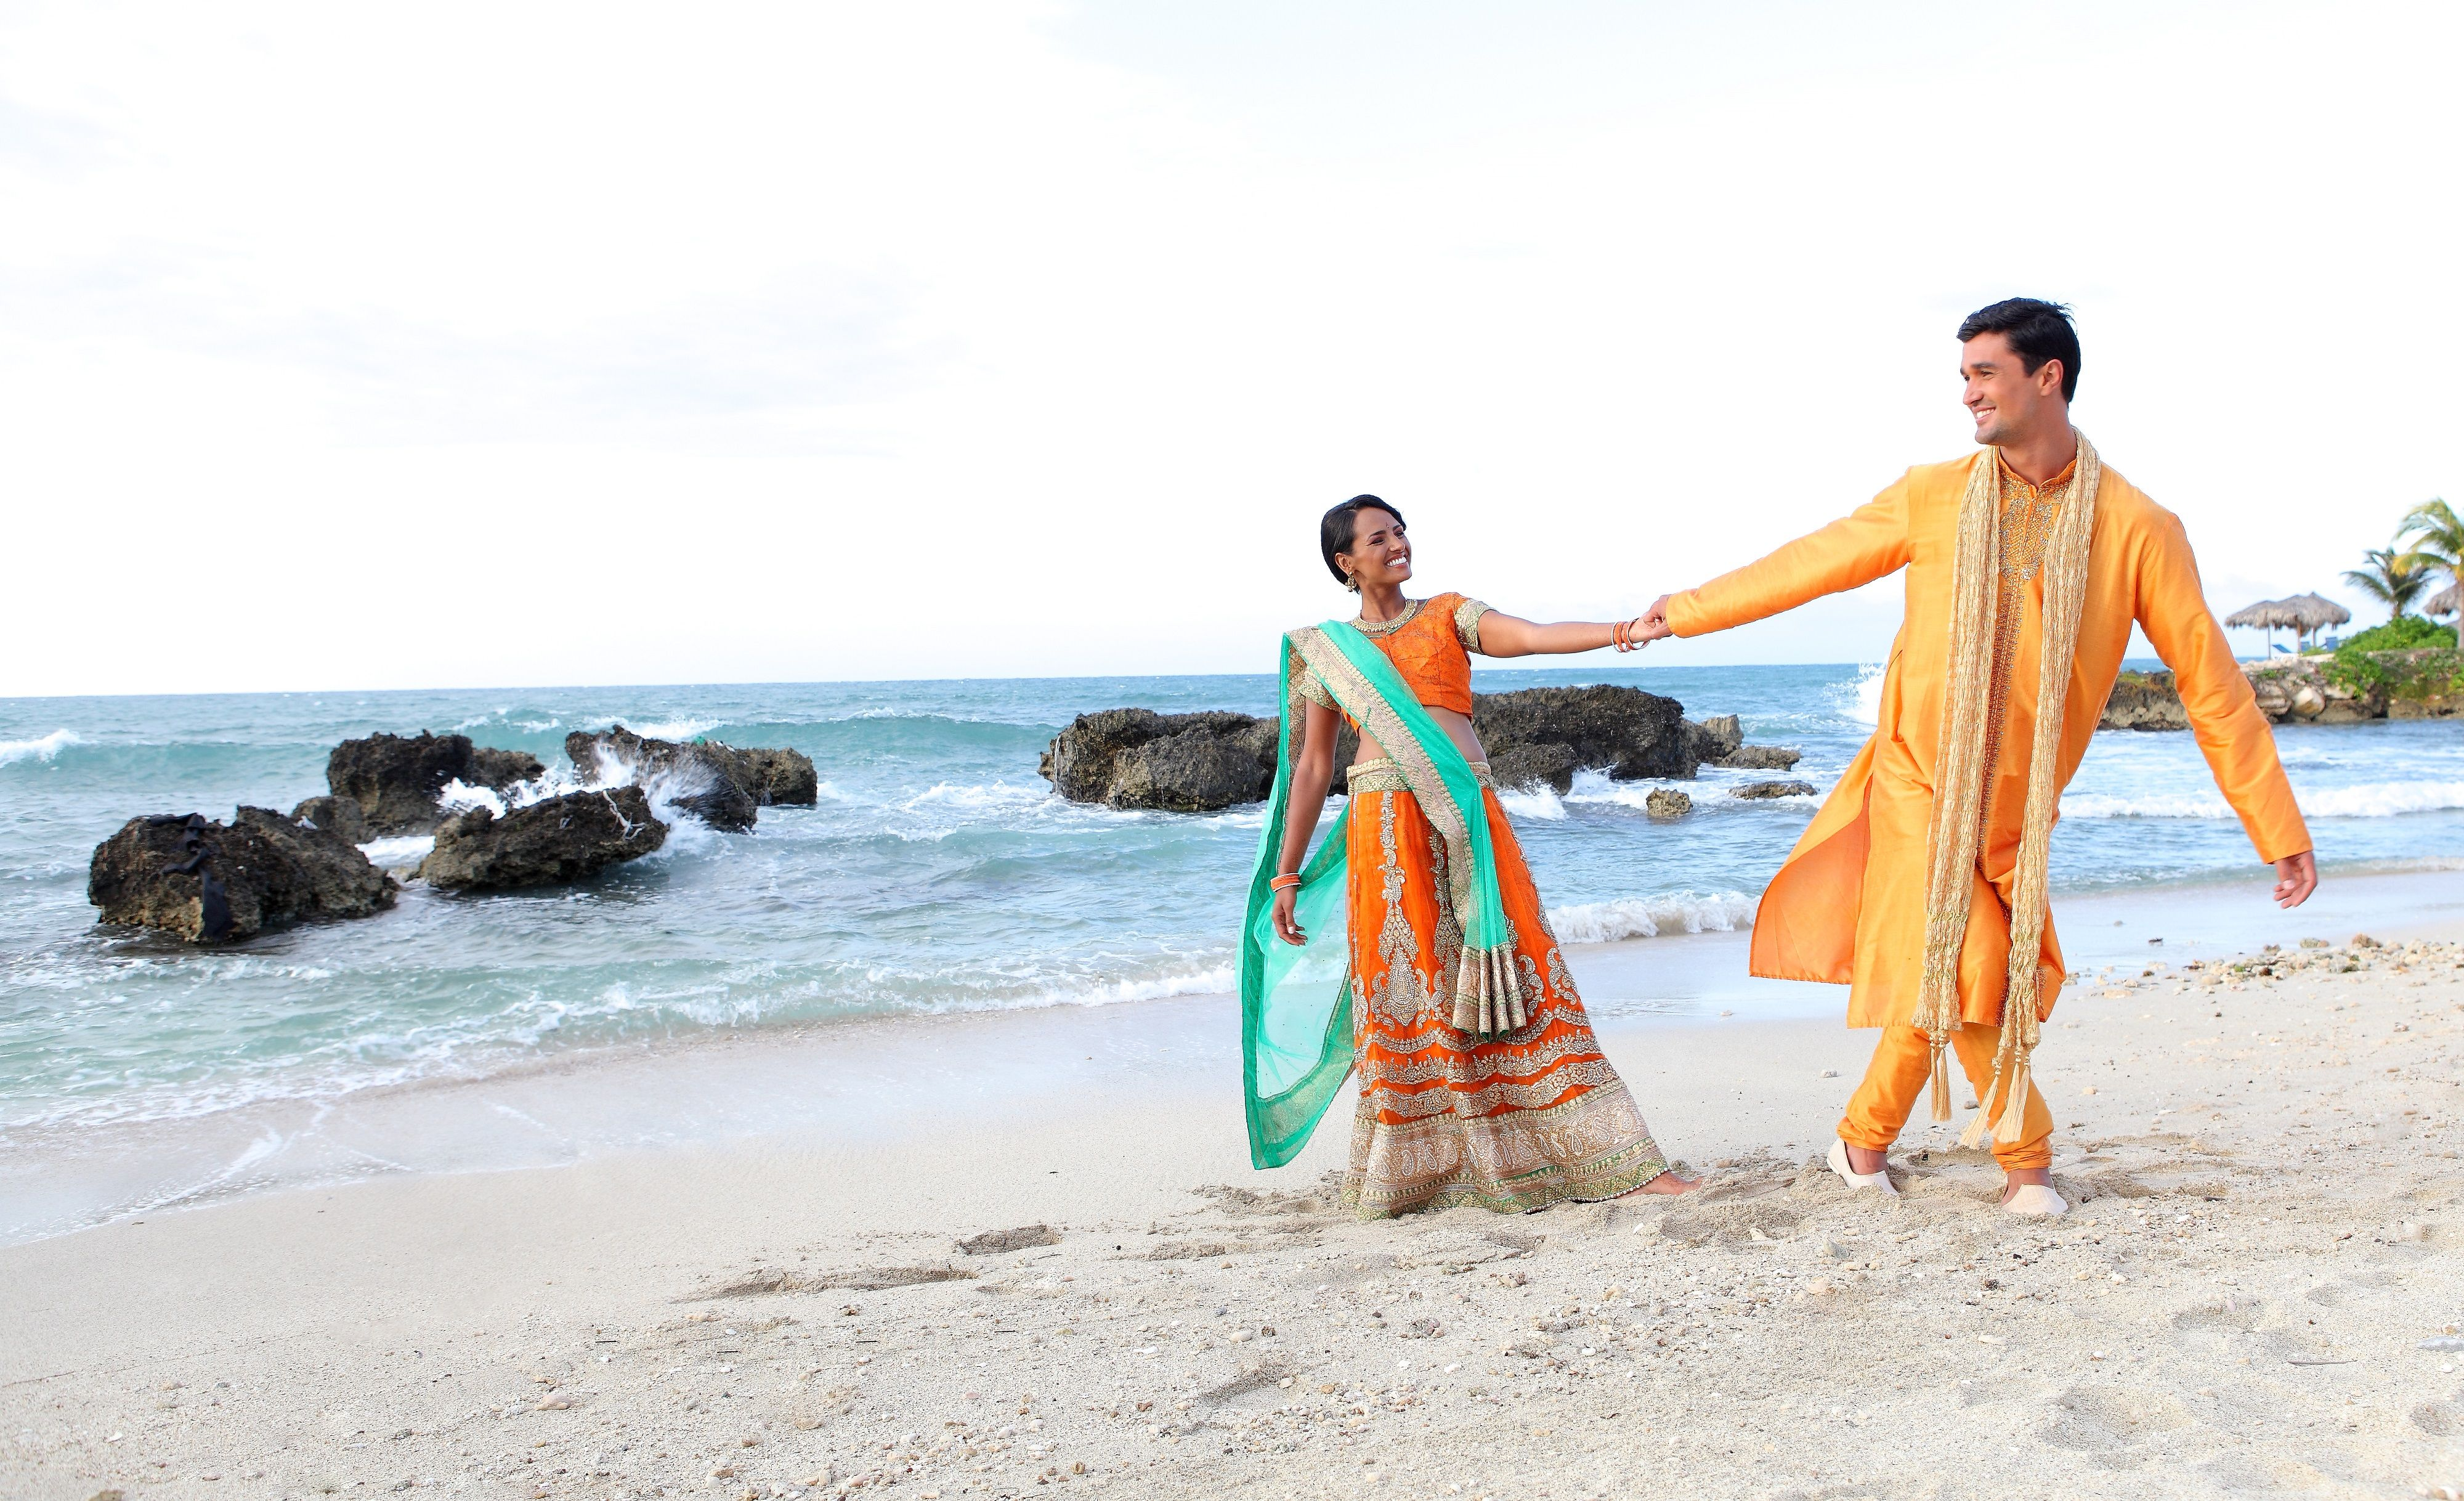 Barefoot bride! South Asian style destination wedding in Jamaica #SouthAsianWedding #WeddingsByPalladium